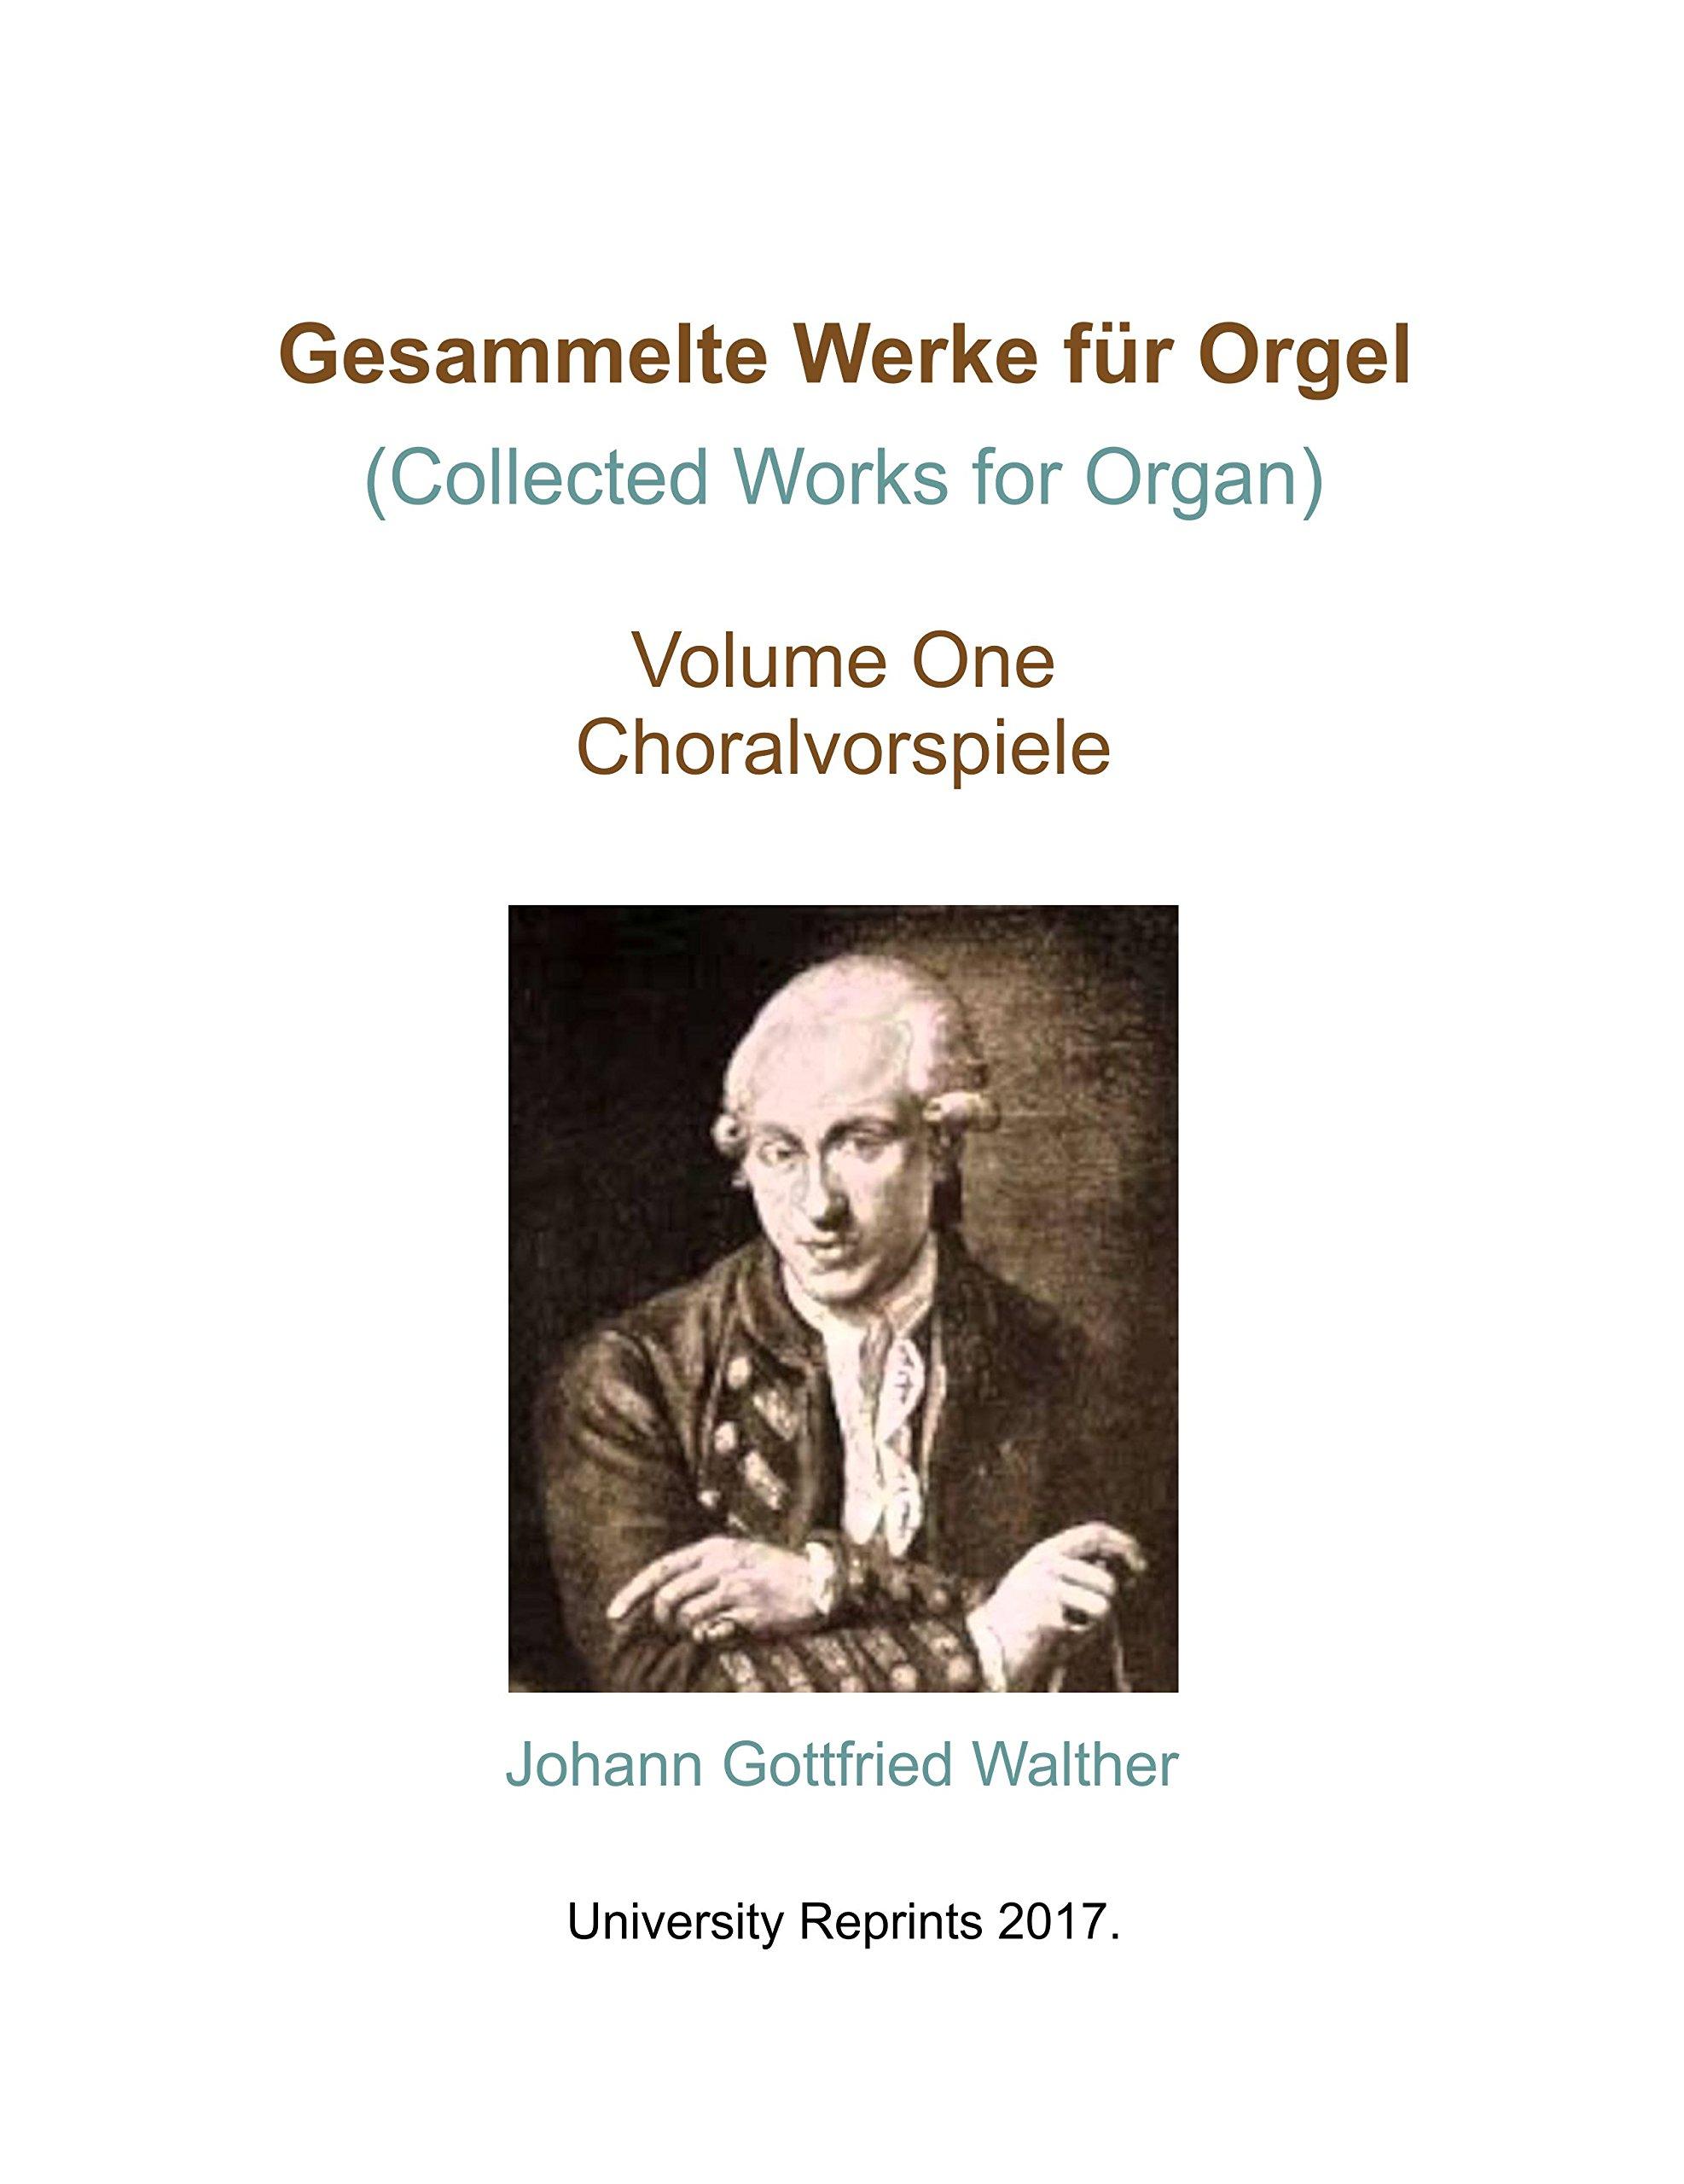 Read Online Gesammelte Werke für Orgel (Collected Works for Organ) Vol 1 Choralvorspiele [Re-Imaged from Original for Greater Clarity. Student Loose Leaf Facsimile Edition. 2017] pdf epub